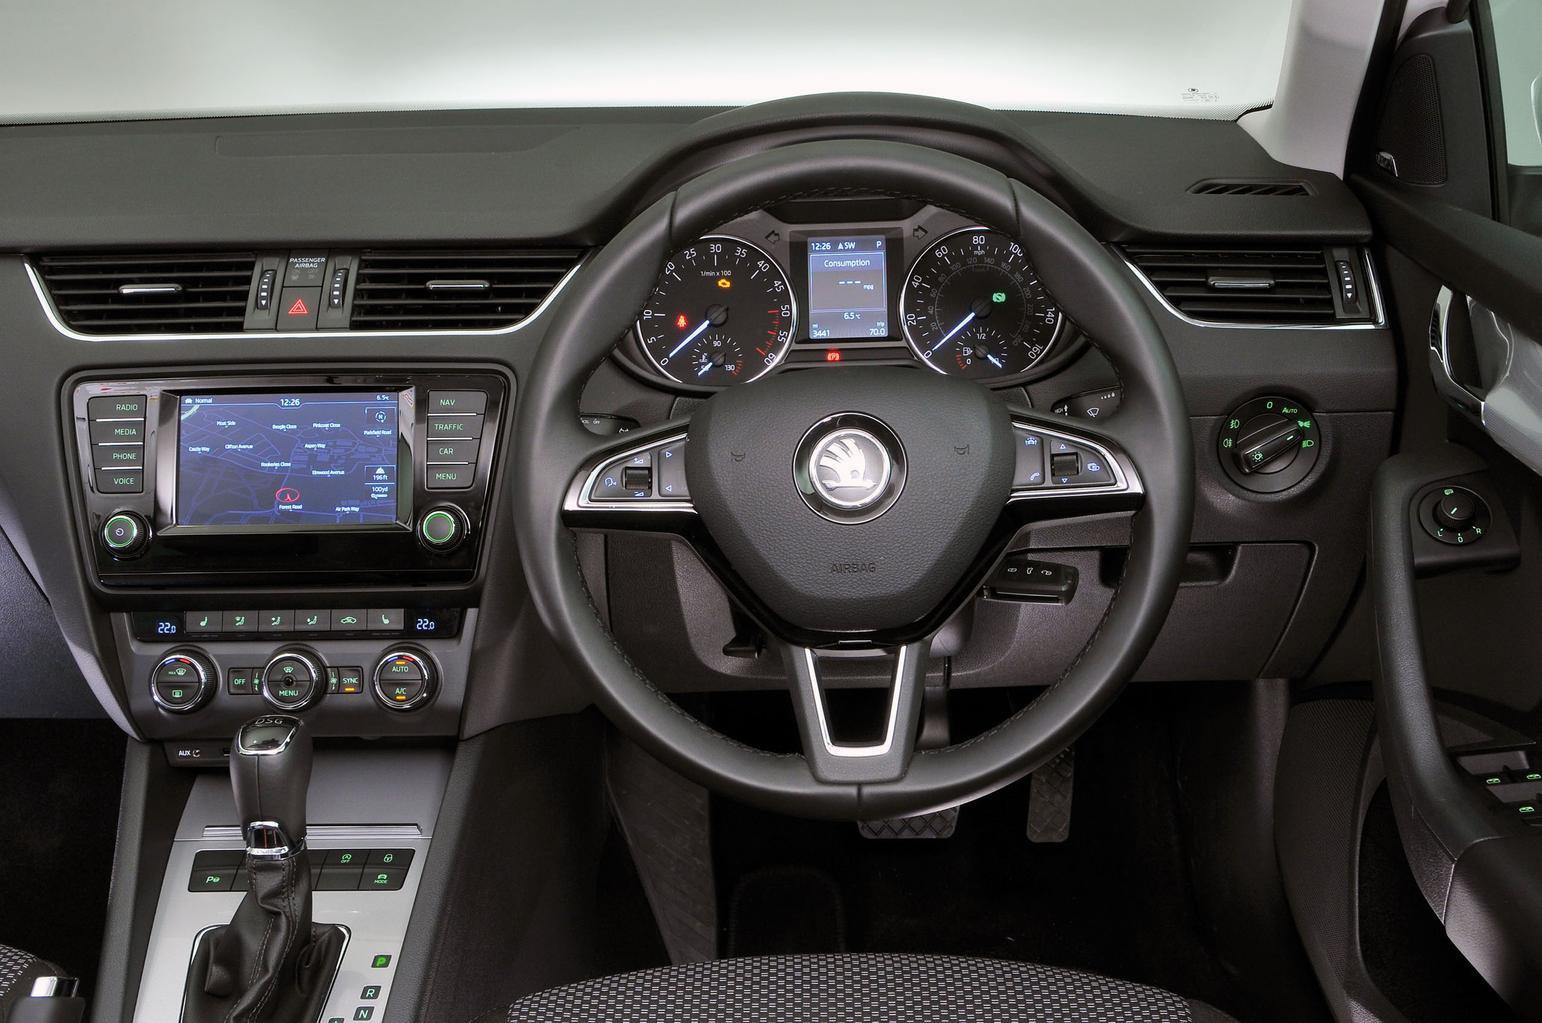 Skoda Octavia Estate vs Vauxhall Astra Sports Tourer